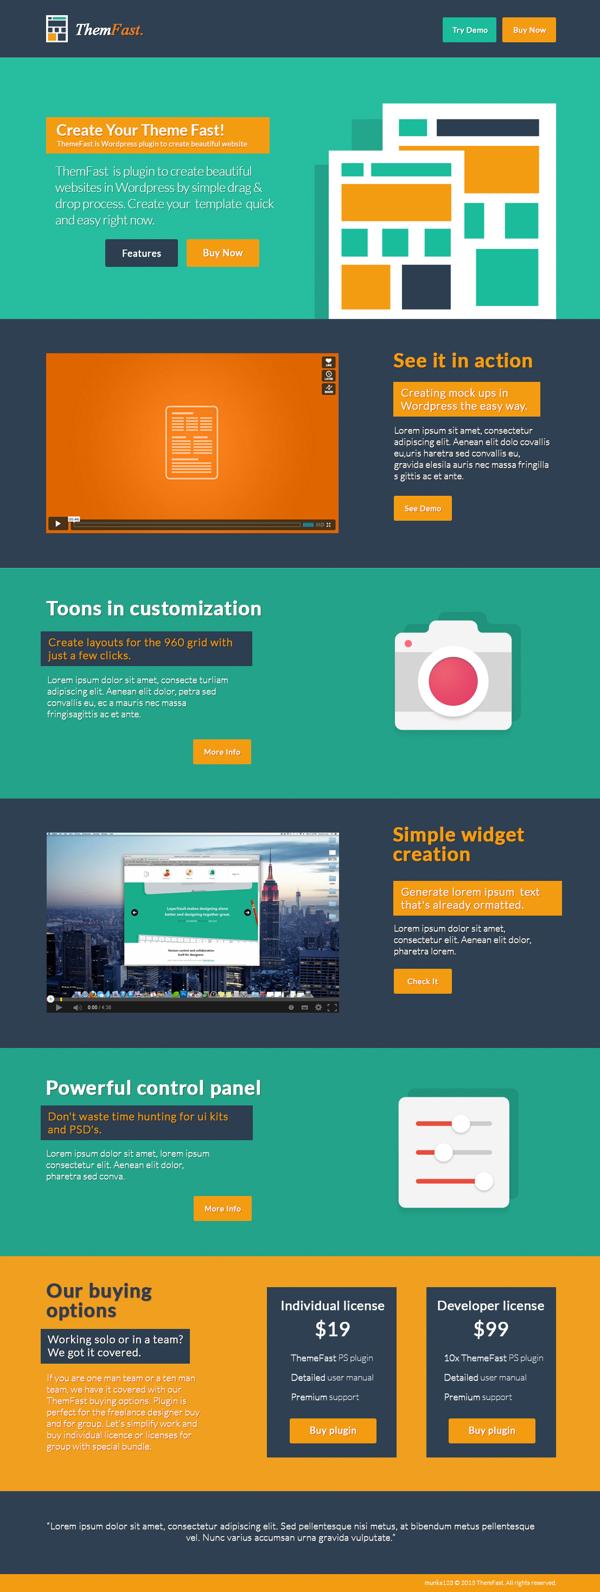 ThemFast plantilla PSD para diseñar paginas web